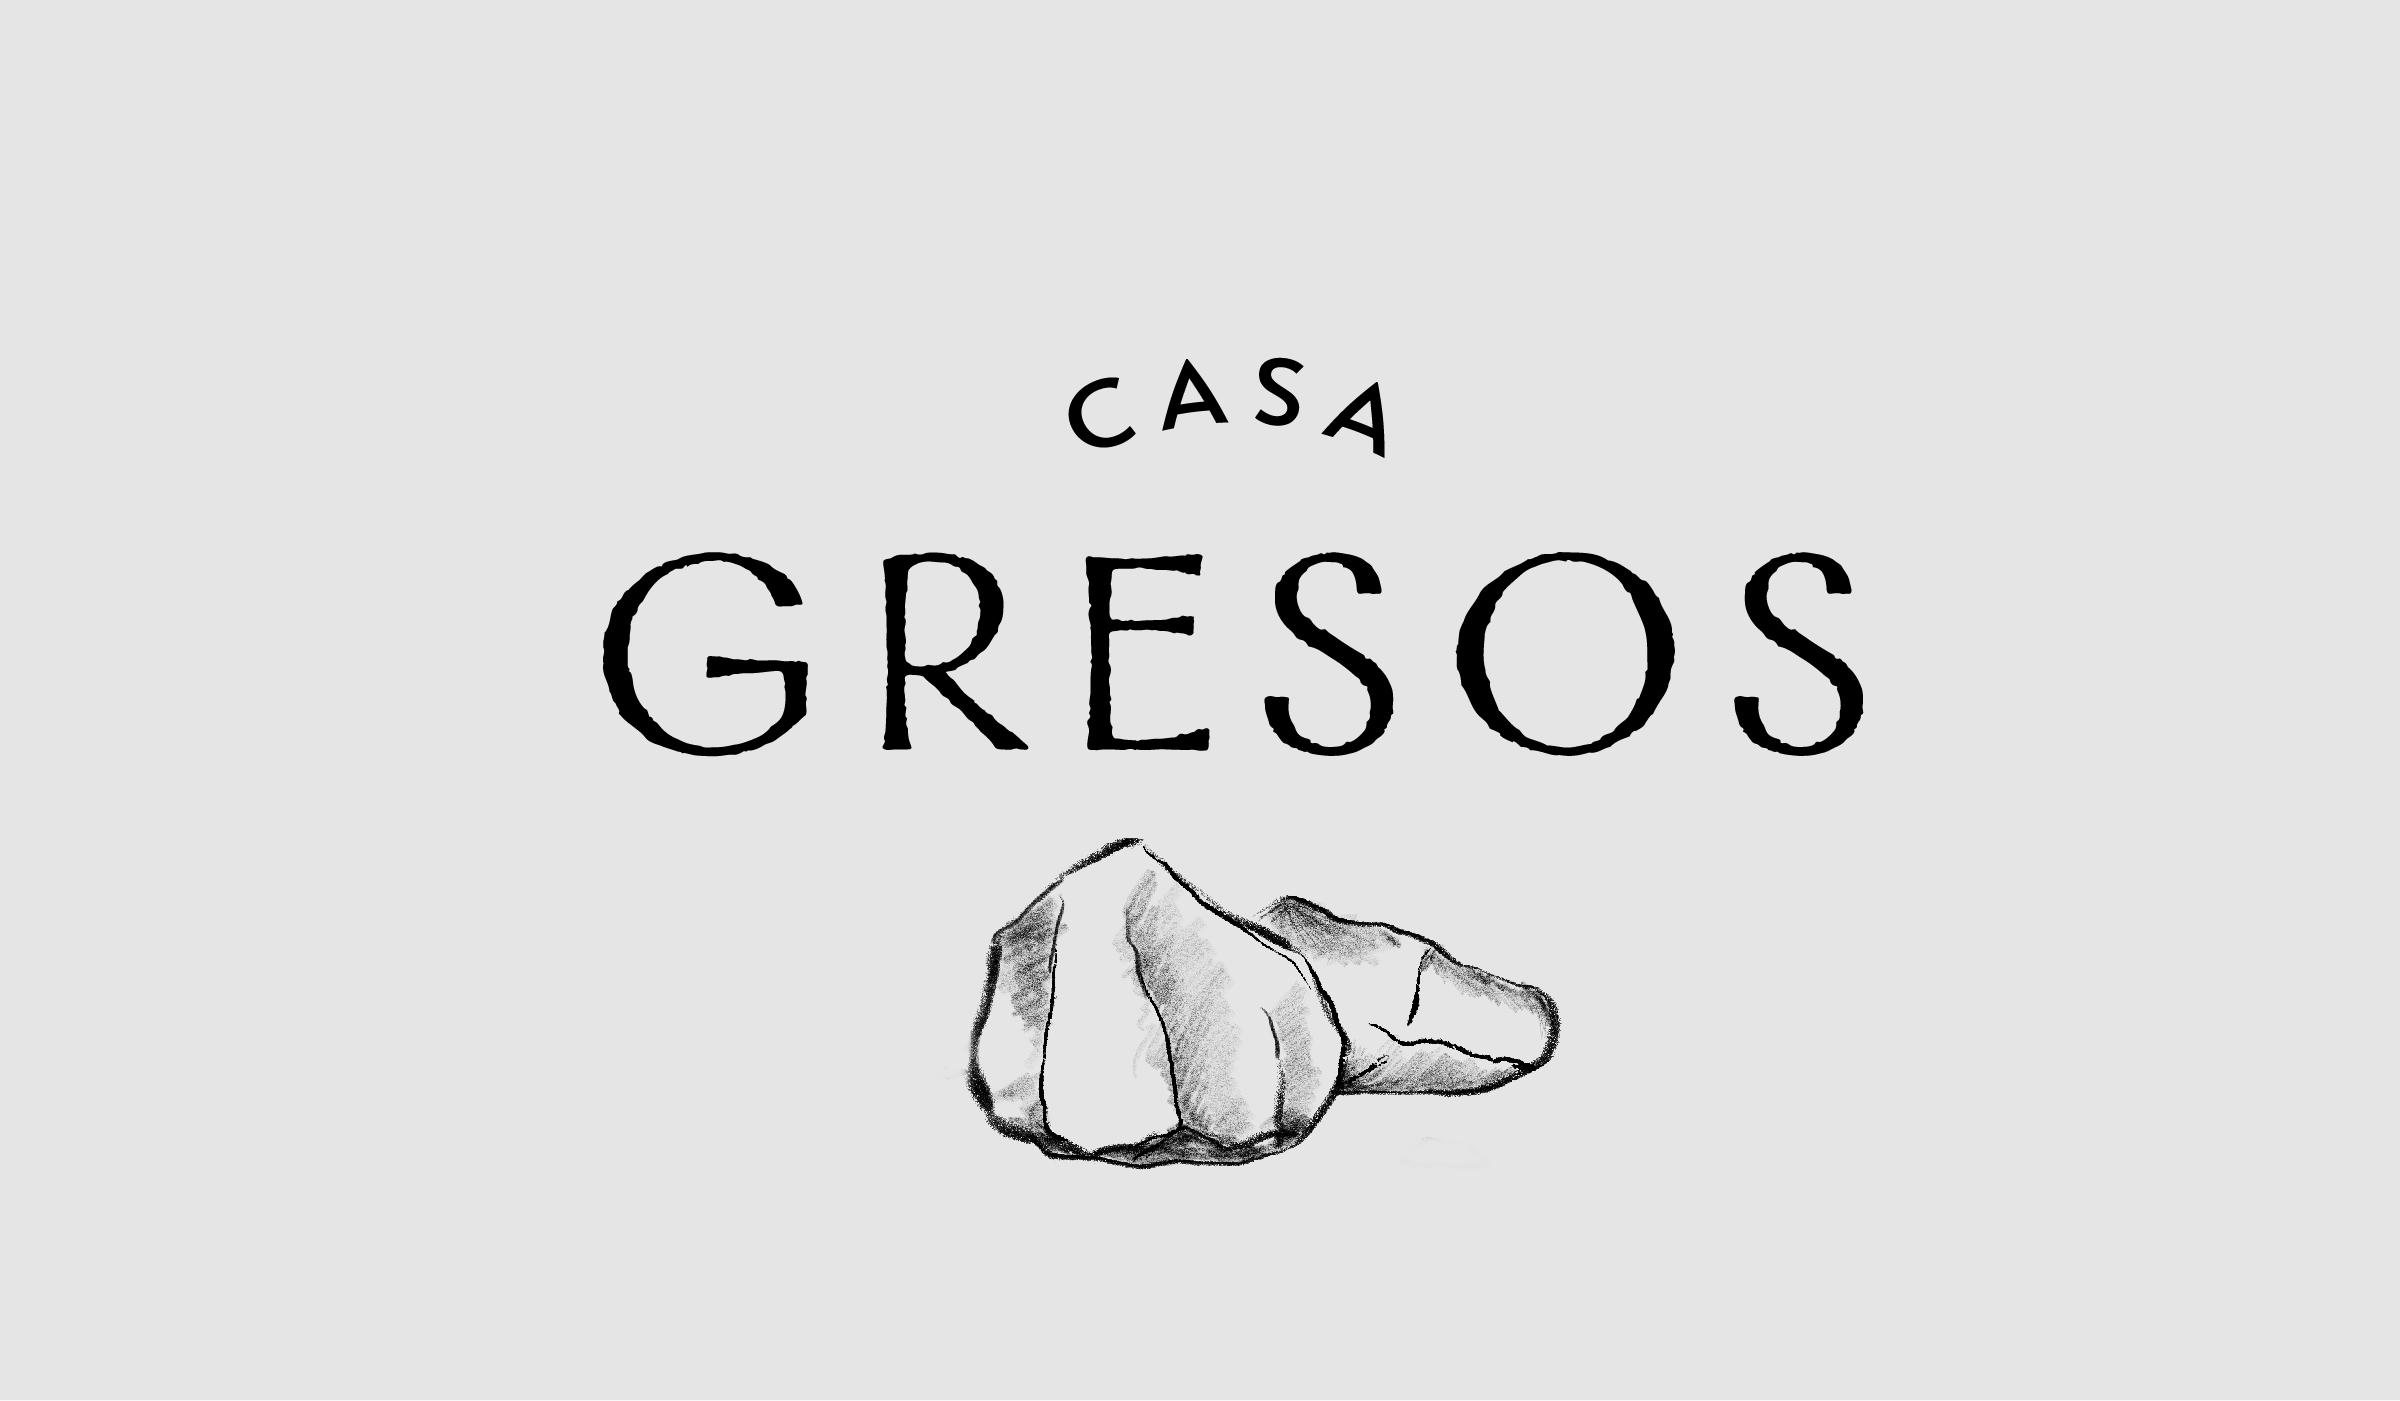 Gresos